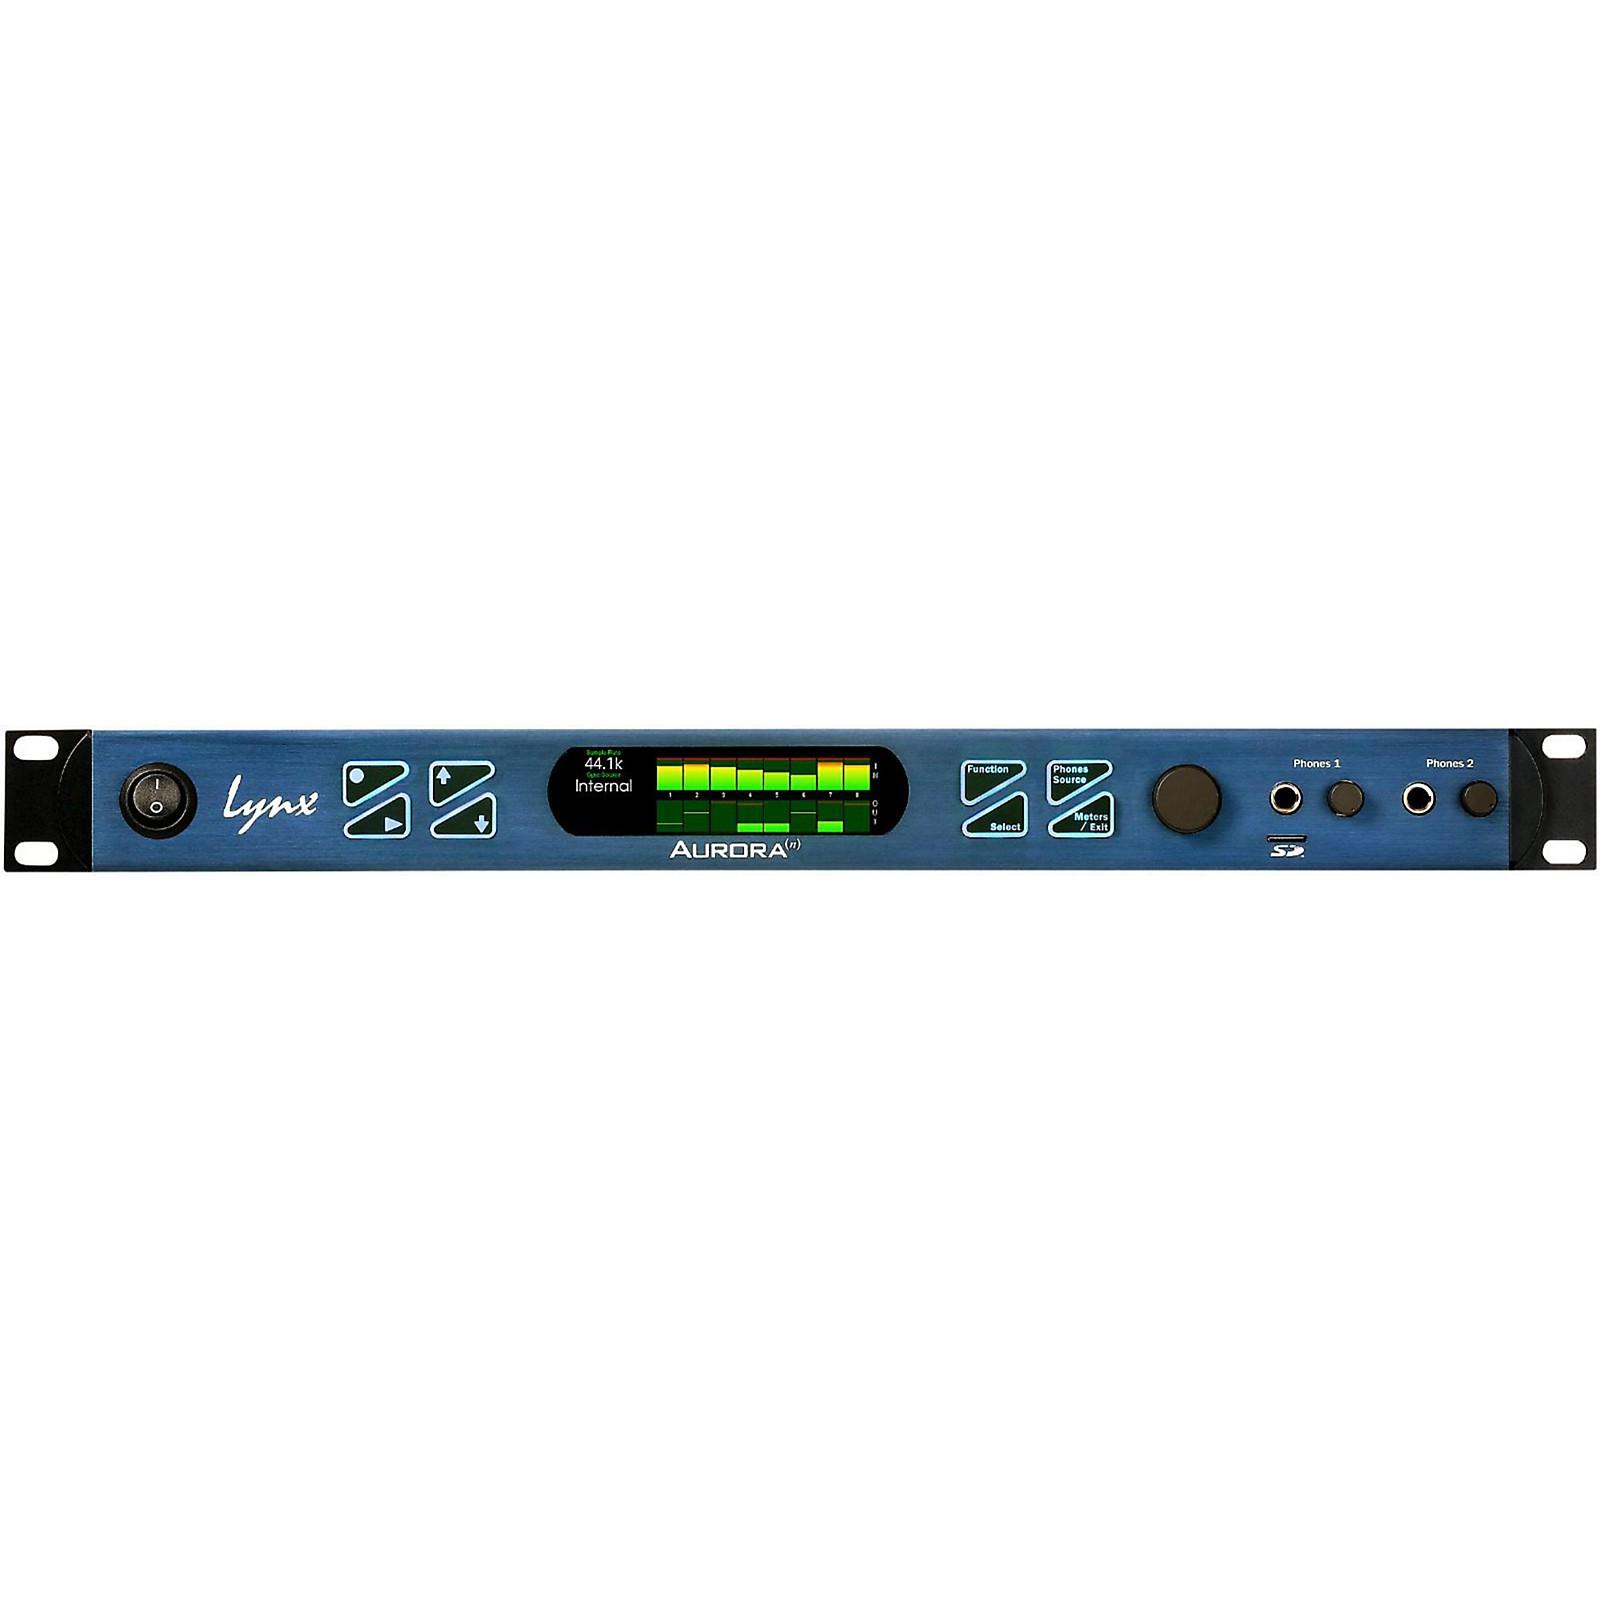 Lynx Aurora(n) 8 Thunderbolt Audio Interface